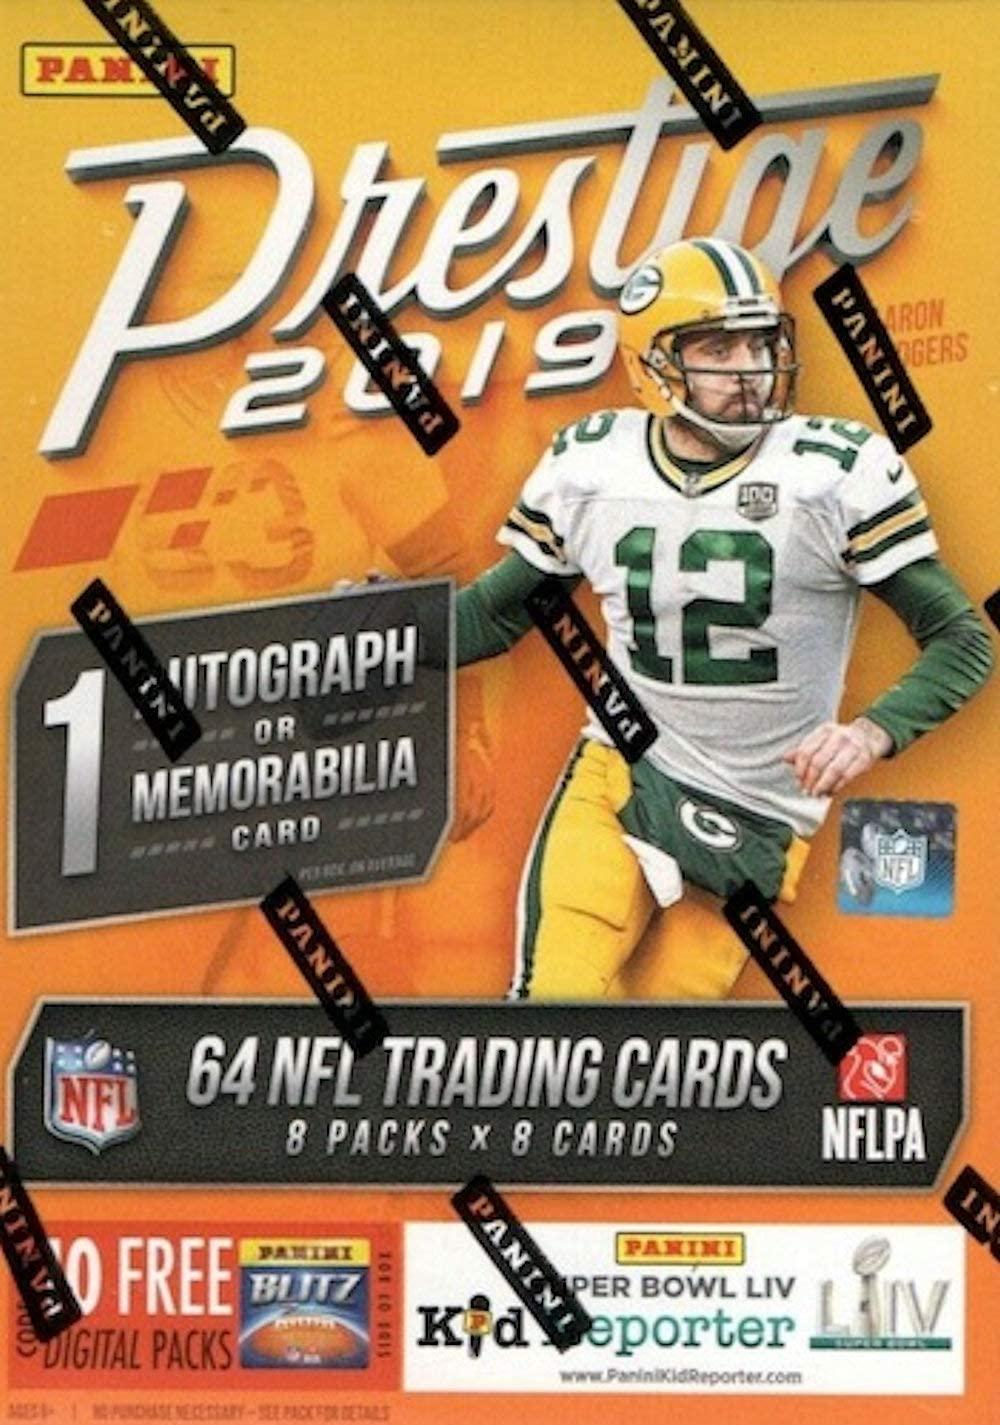 2019 Panini Prestige NFL Football BLASTER box (64 cards incl. ONE Memorabilia or Autograph card)